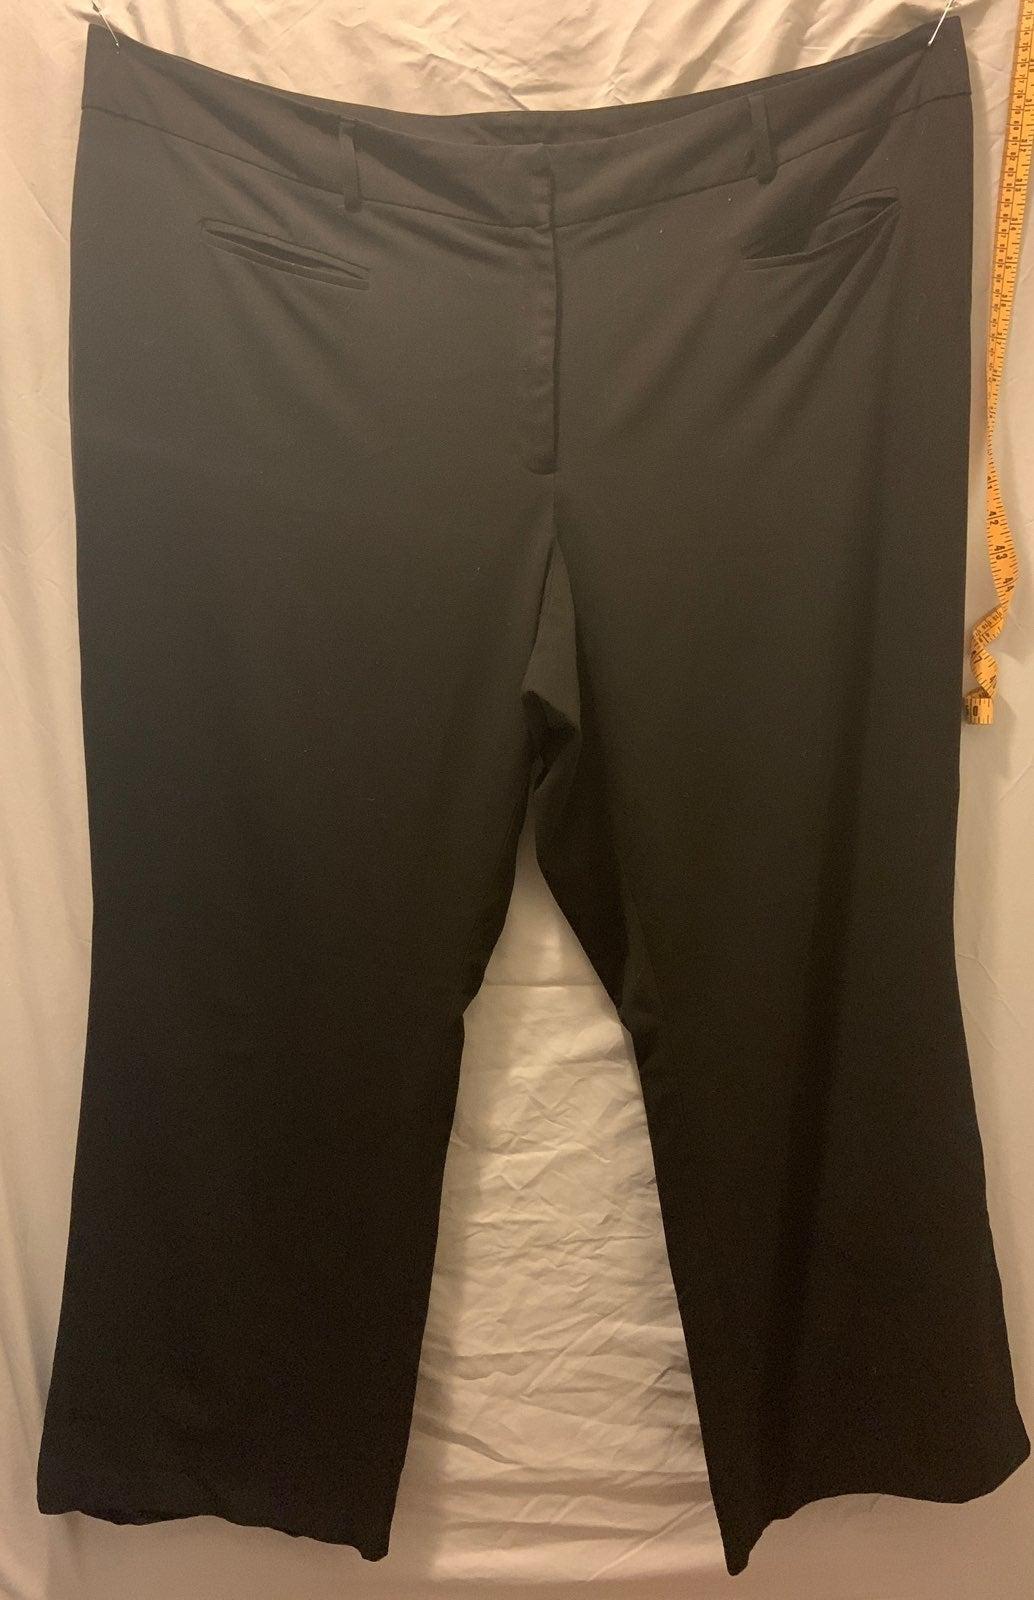 plus size 24 black dress pants